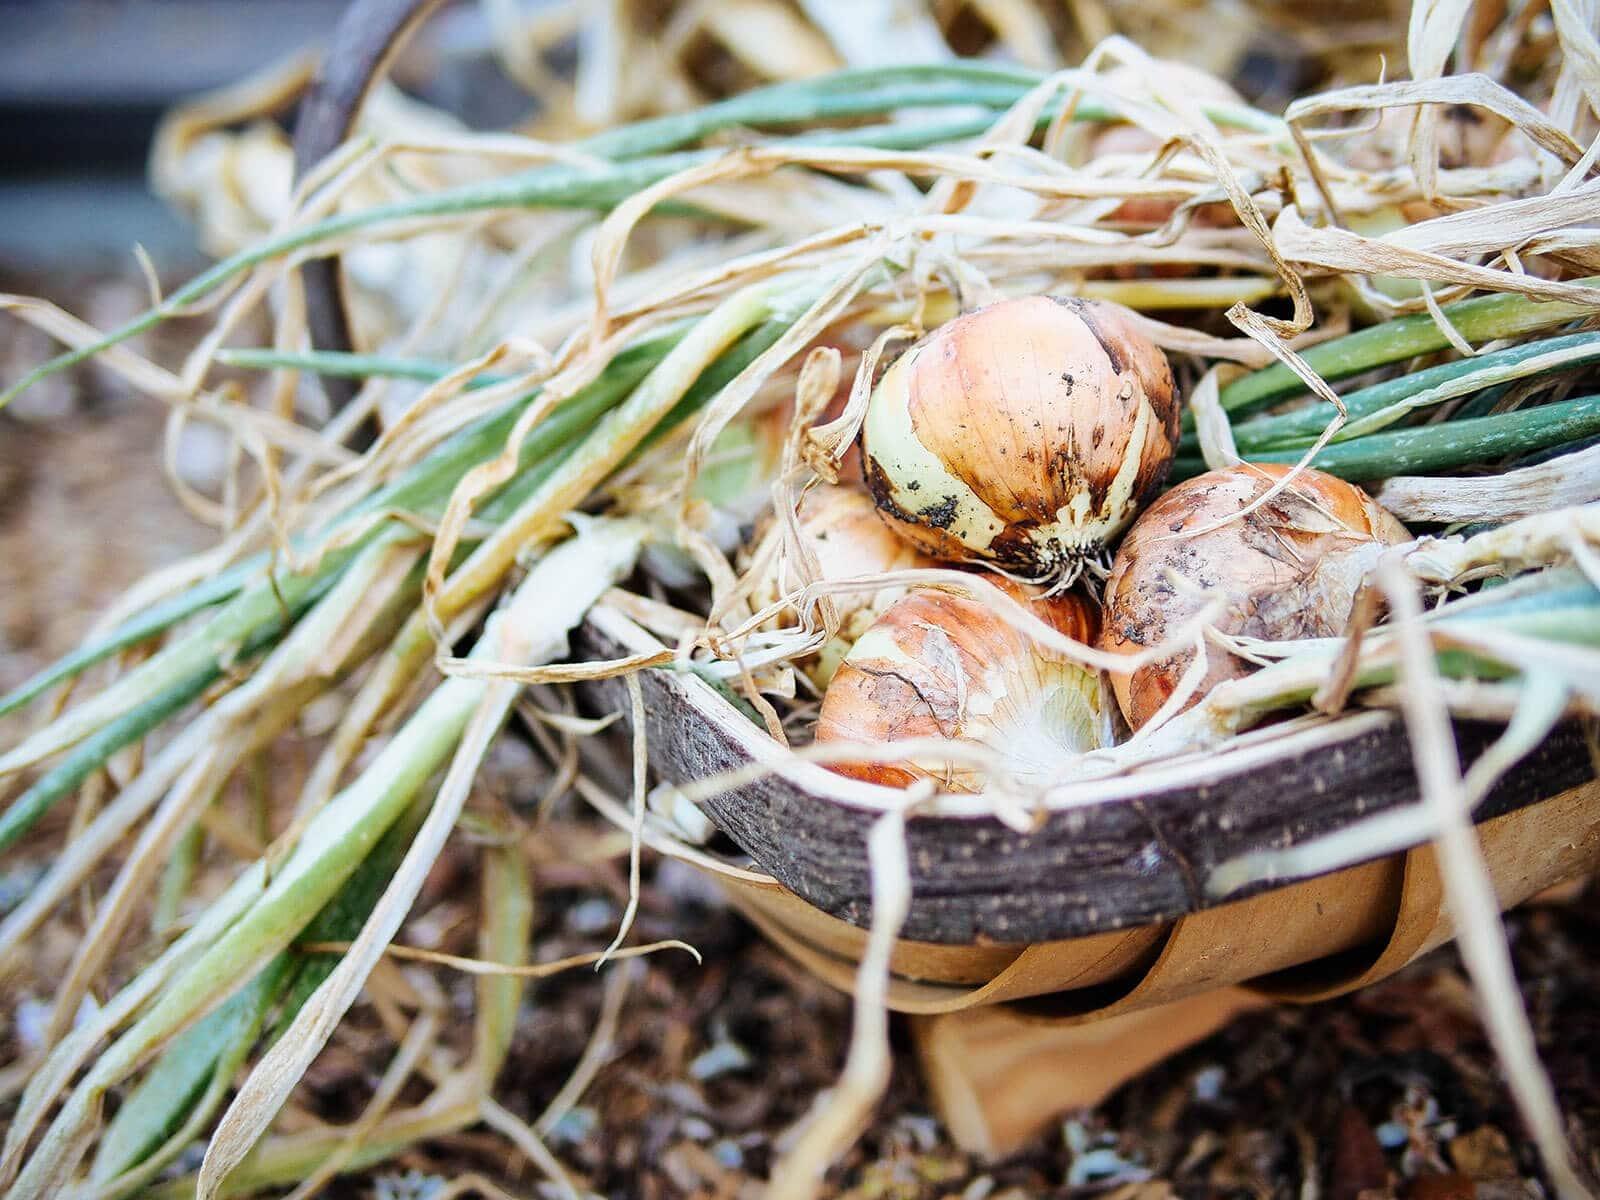 Onion harvest in a garden trug